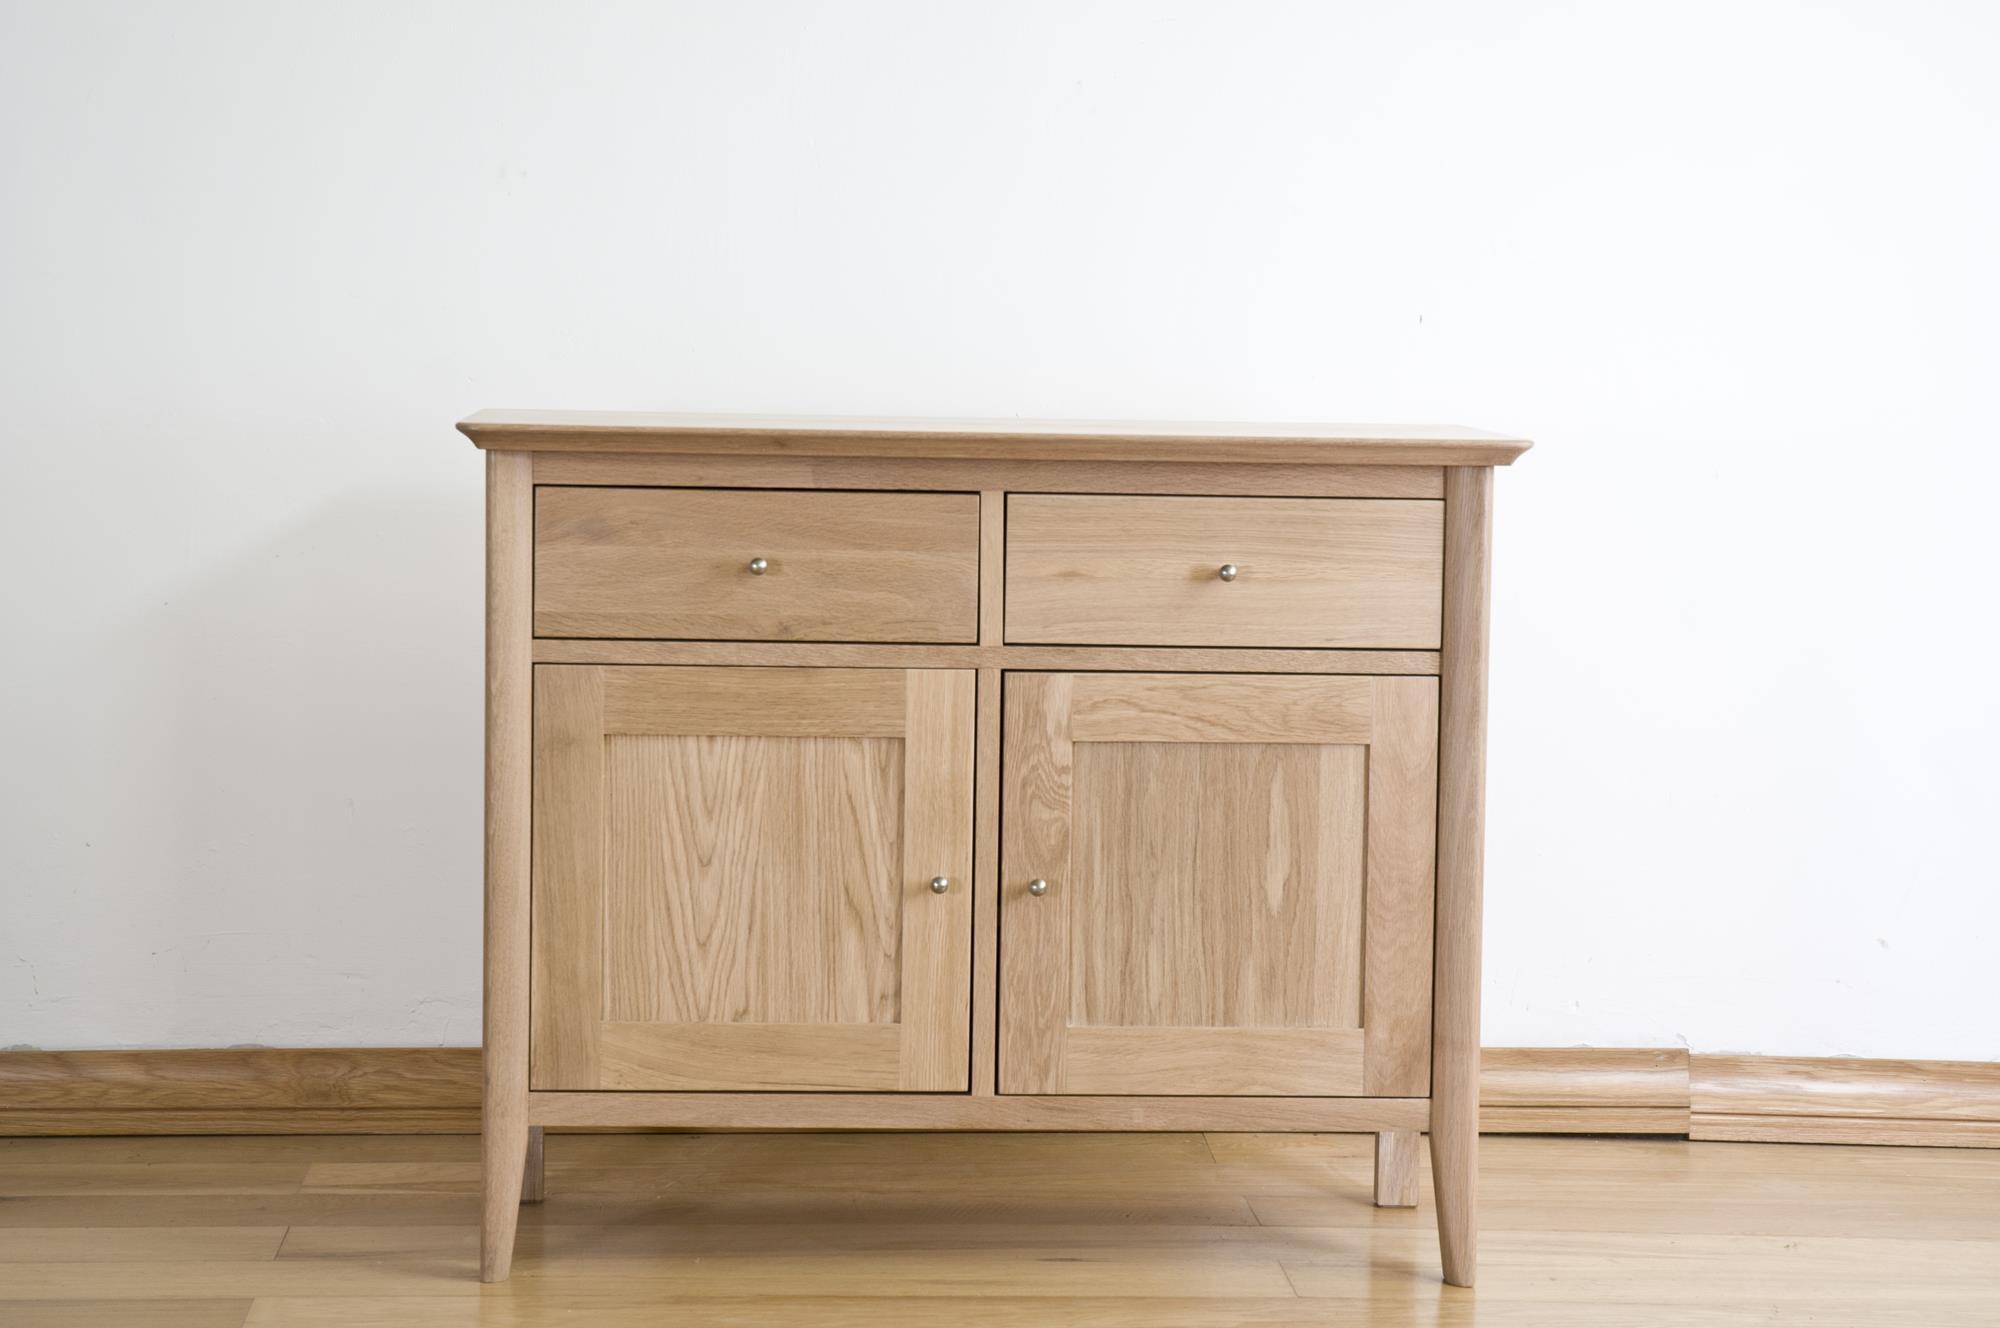 Sorrento Solid Oak Sideboard - Small Narrow 2 Door 2 Drawer